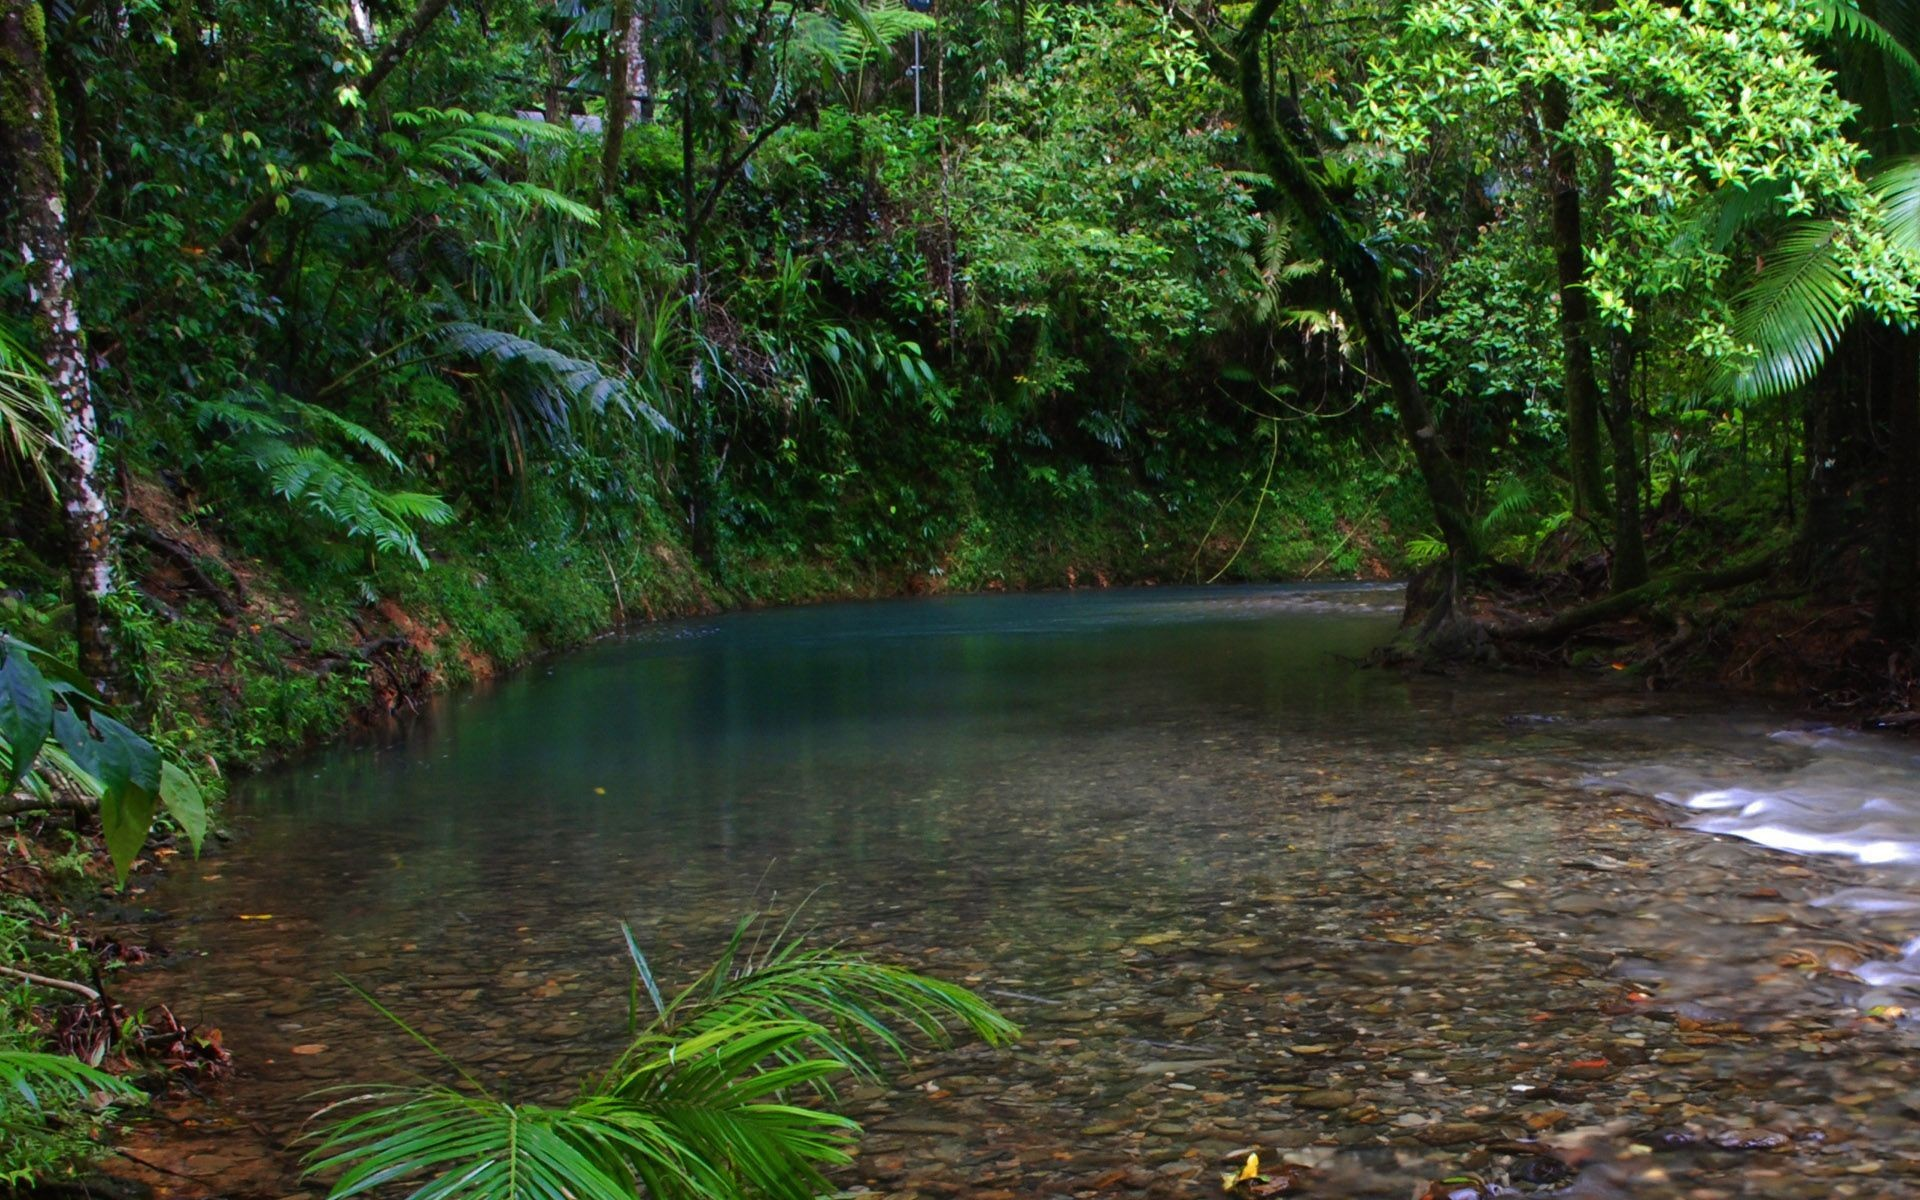 Pretty Rainforest Wallpaper Images HQ22